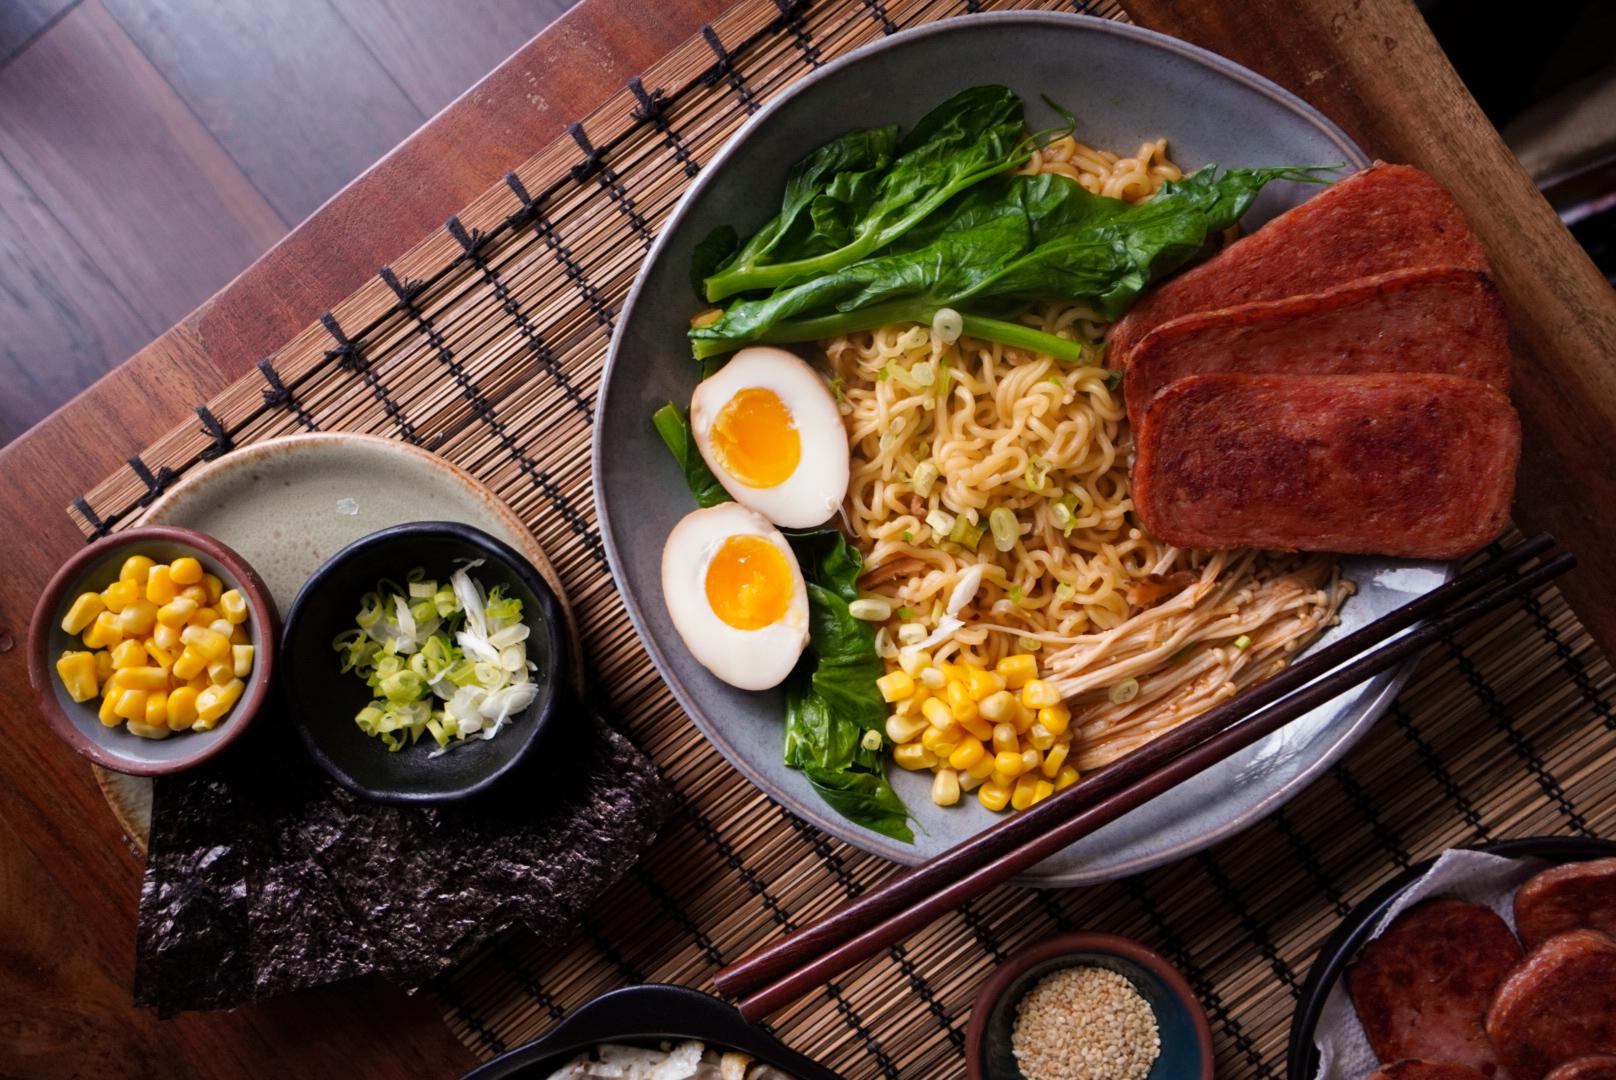 instant noodles ramen shin ramyun spam corn egg vegetables green onion